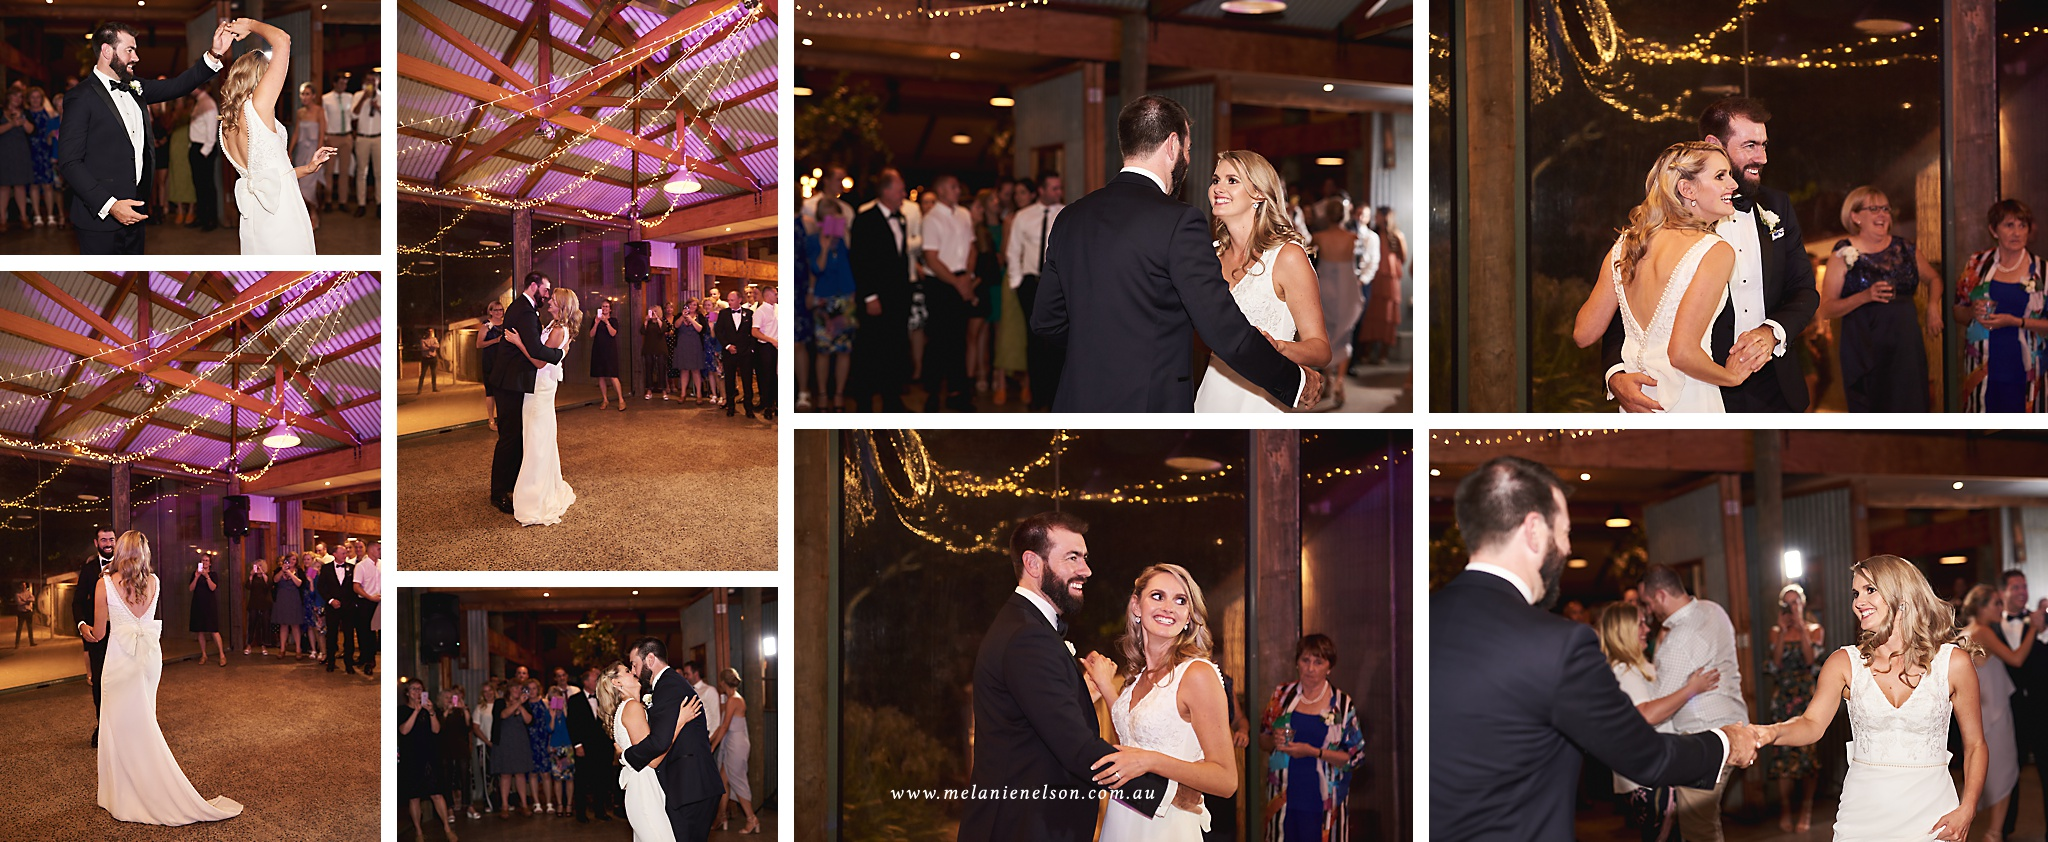 longview_vineyard_wedding_0093.jpg